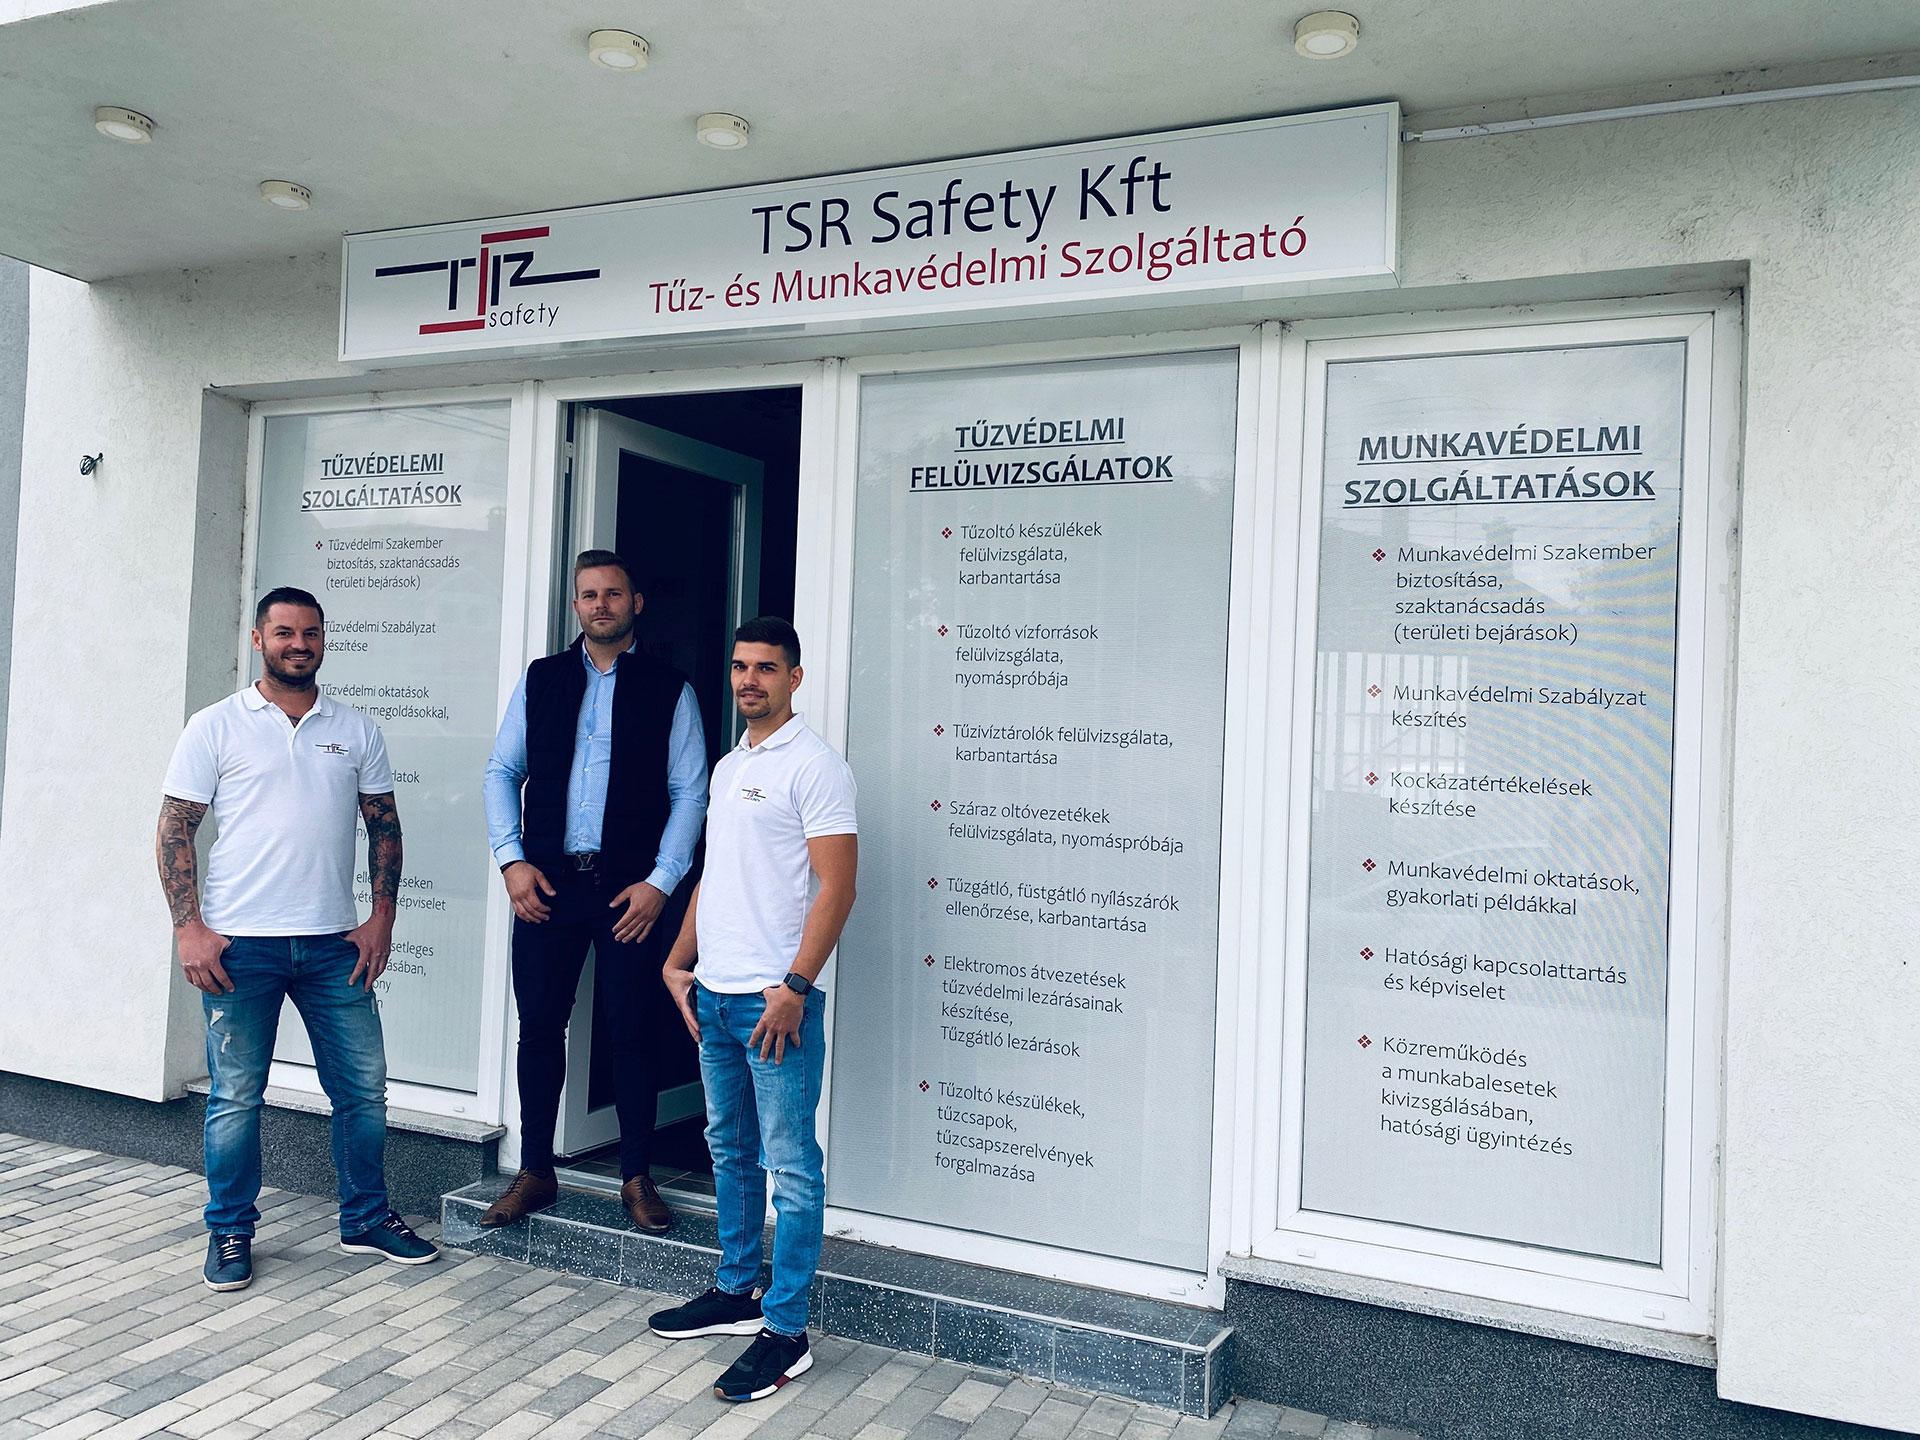 TSR Safety